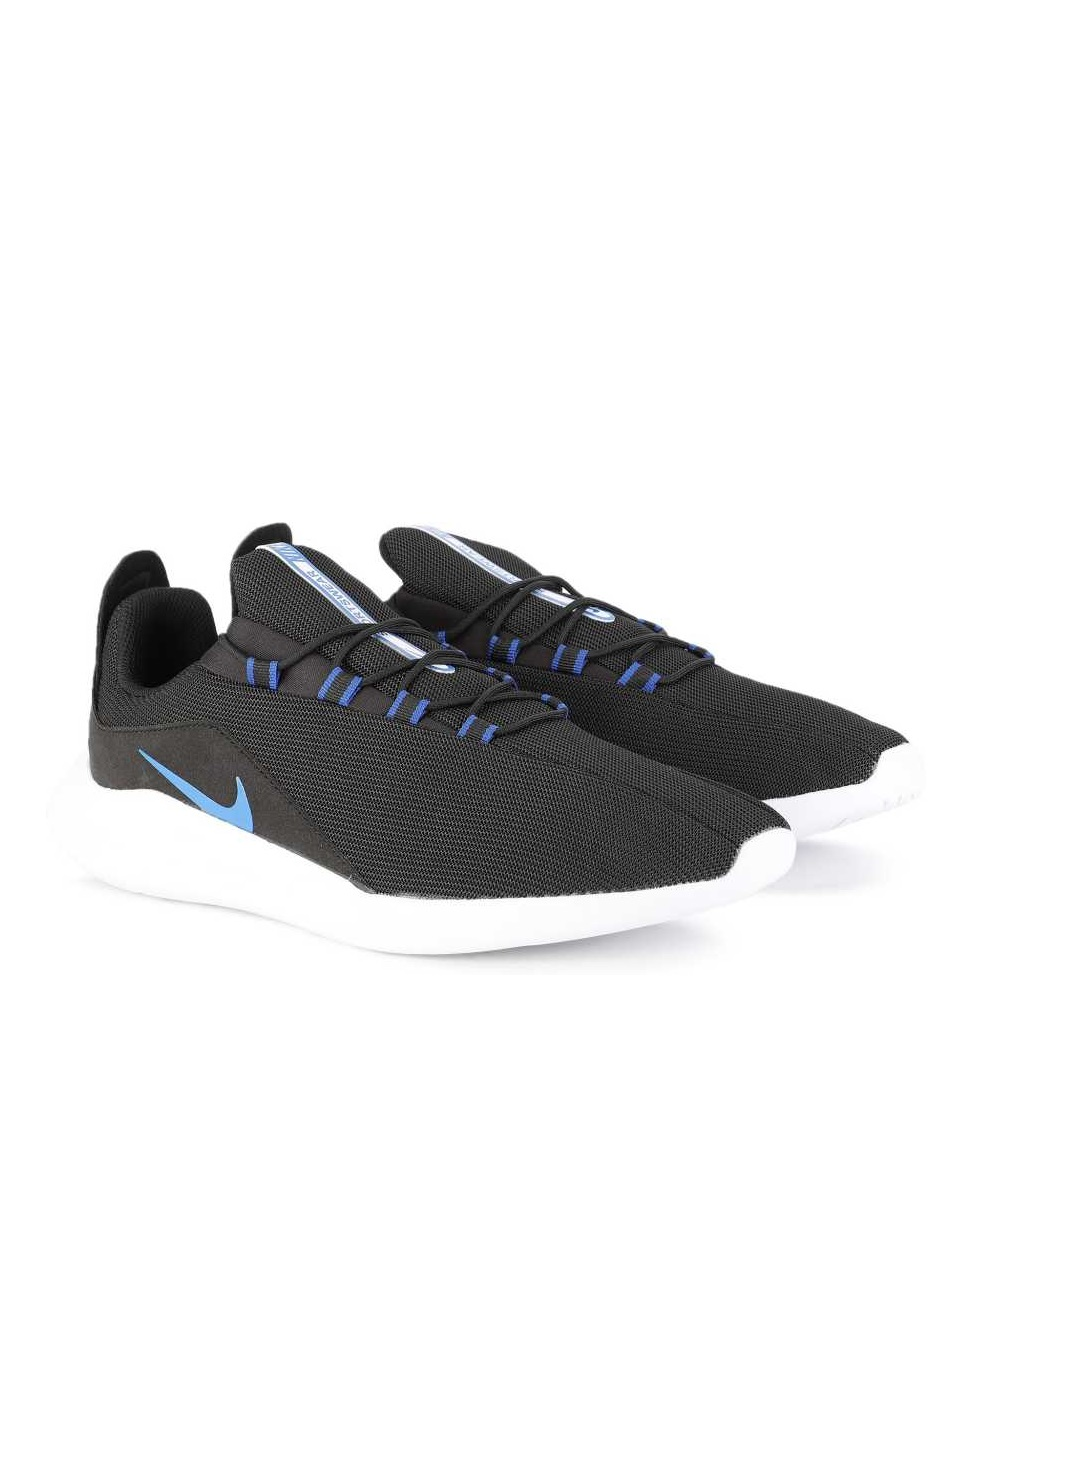 Nike | Nike Men VIALE Running Shoes